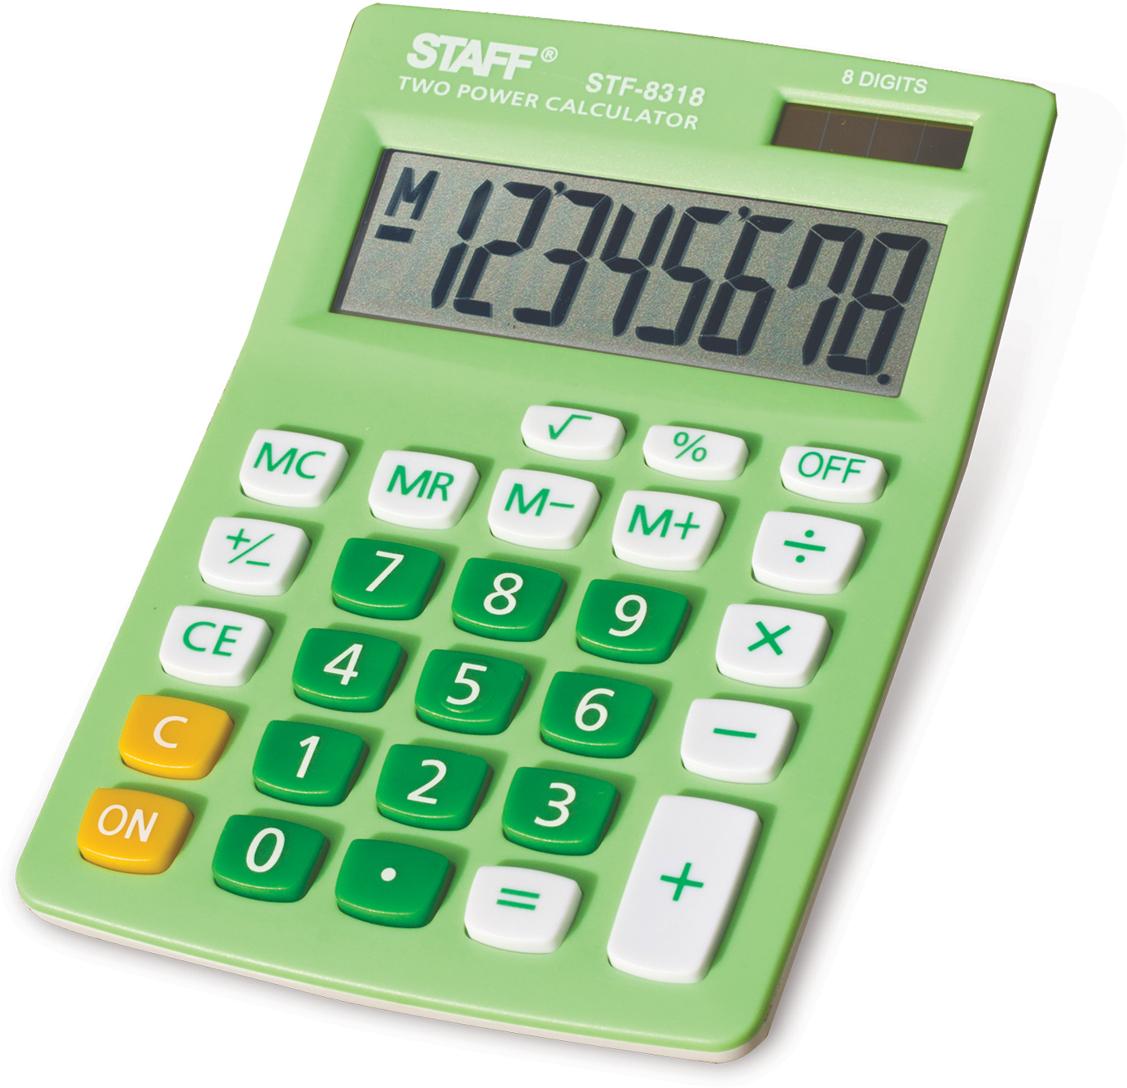 Калькулятор настольный Staff STF-8318, цвет: зеленый канцелярия staff калькулятор настольный stf 555 white